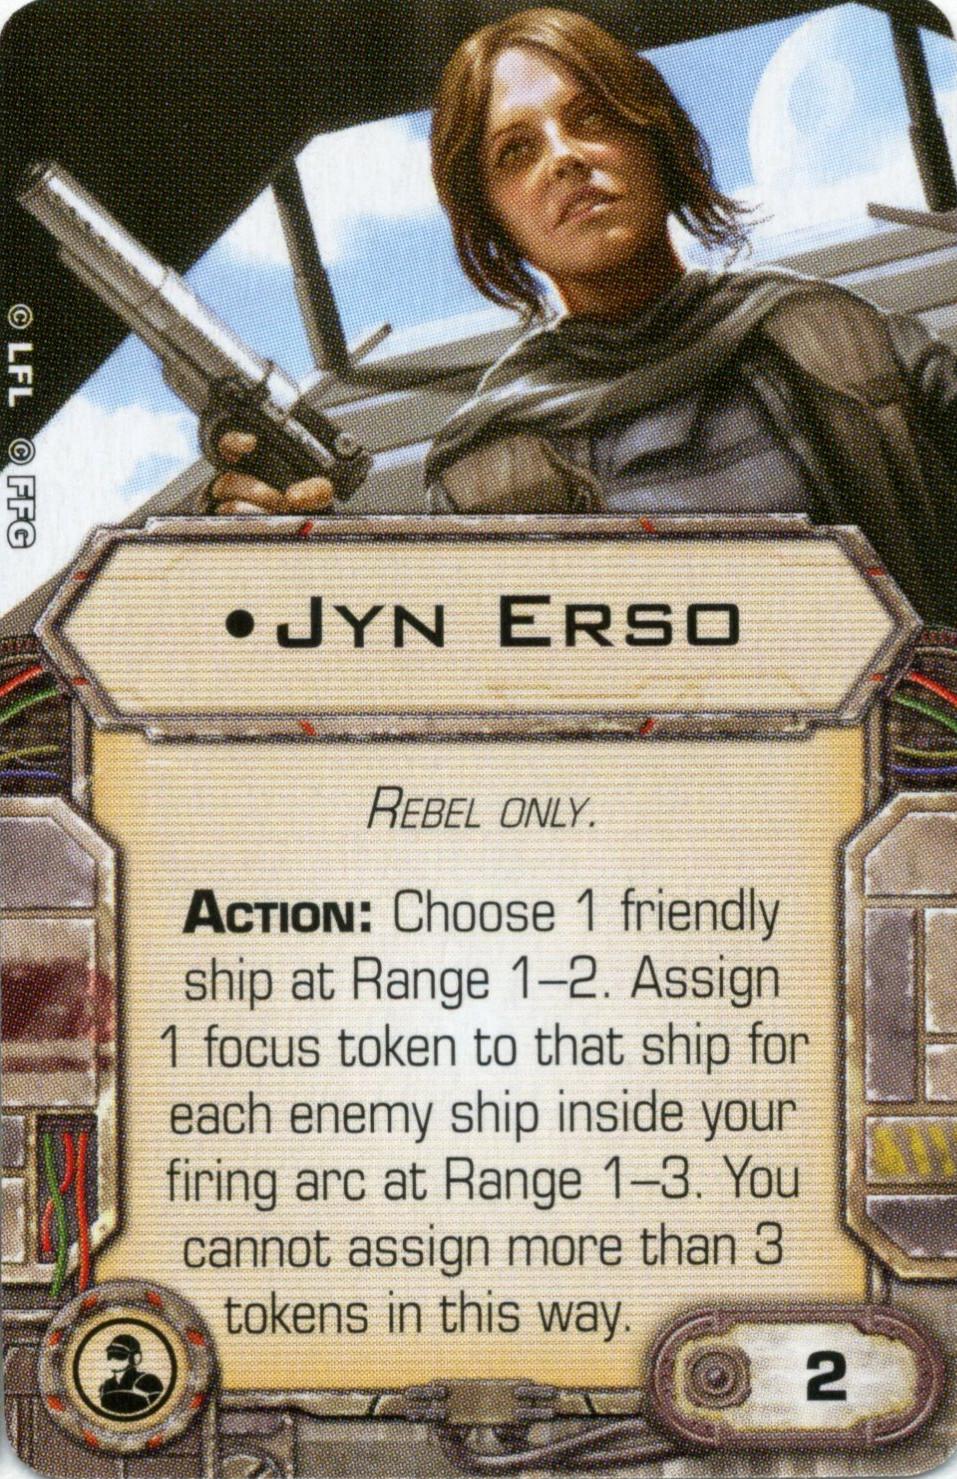 X-Wing Miniatures - Jyn Erso